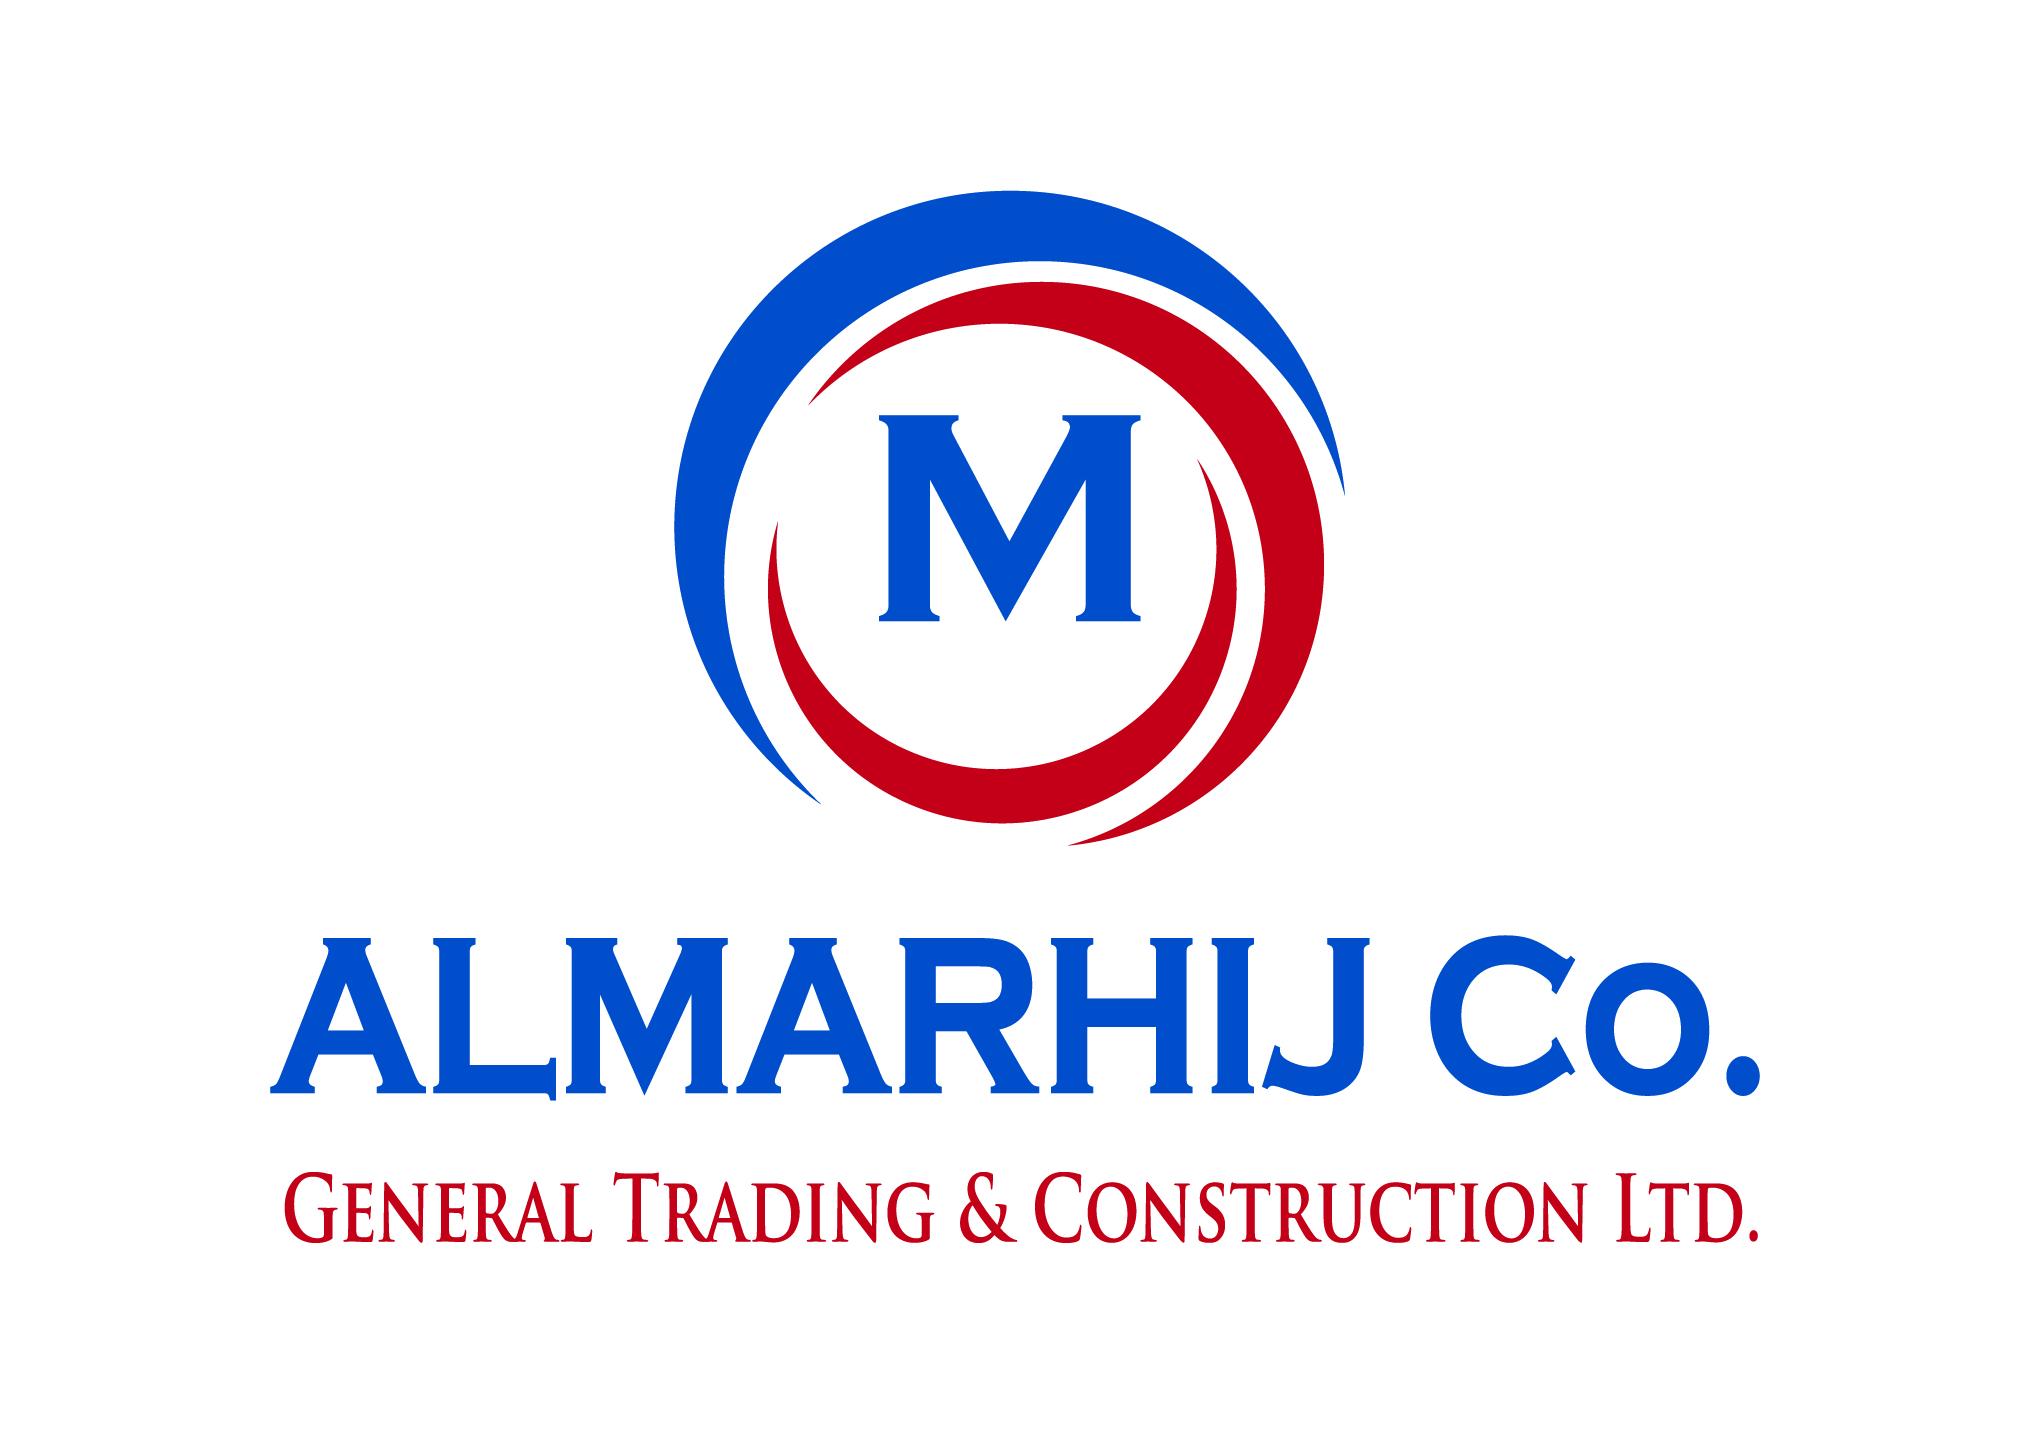 ALMARHIJ Co.